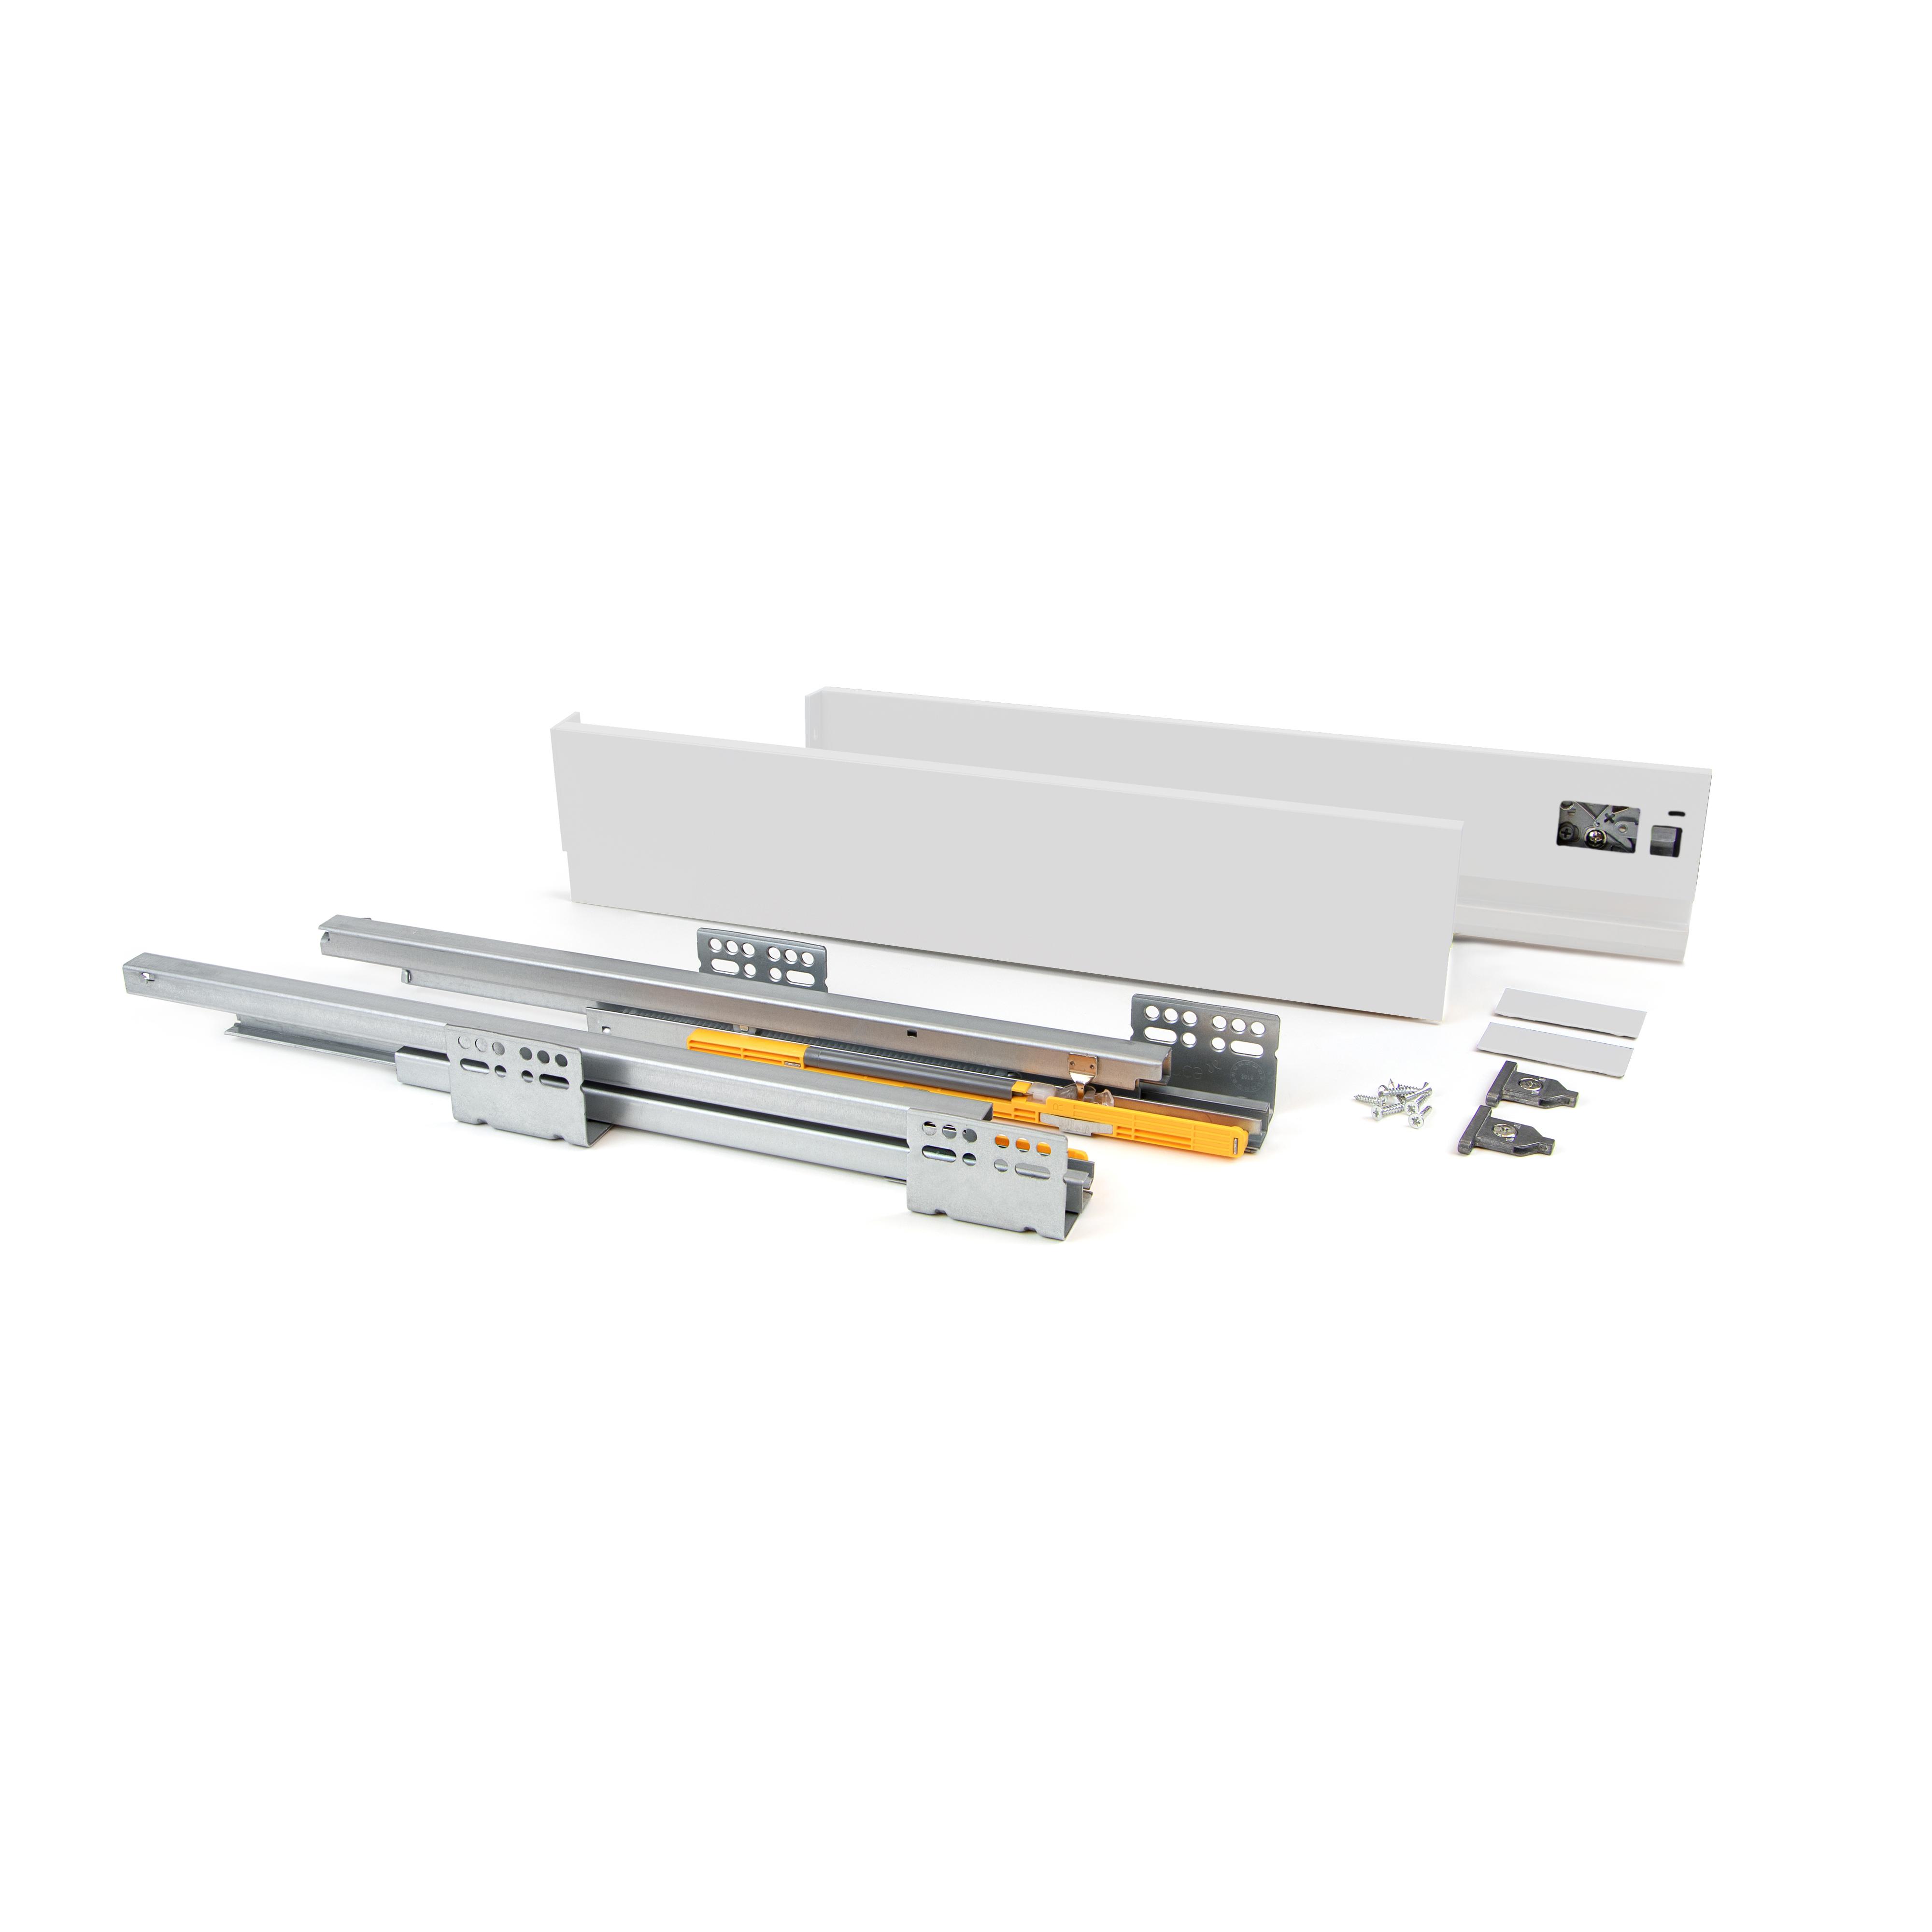 Emuca Kit cassetto per cucina Concept, altezza 138 mm, prof. 450 mm, chiusura soft, Acciaio, Bianco